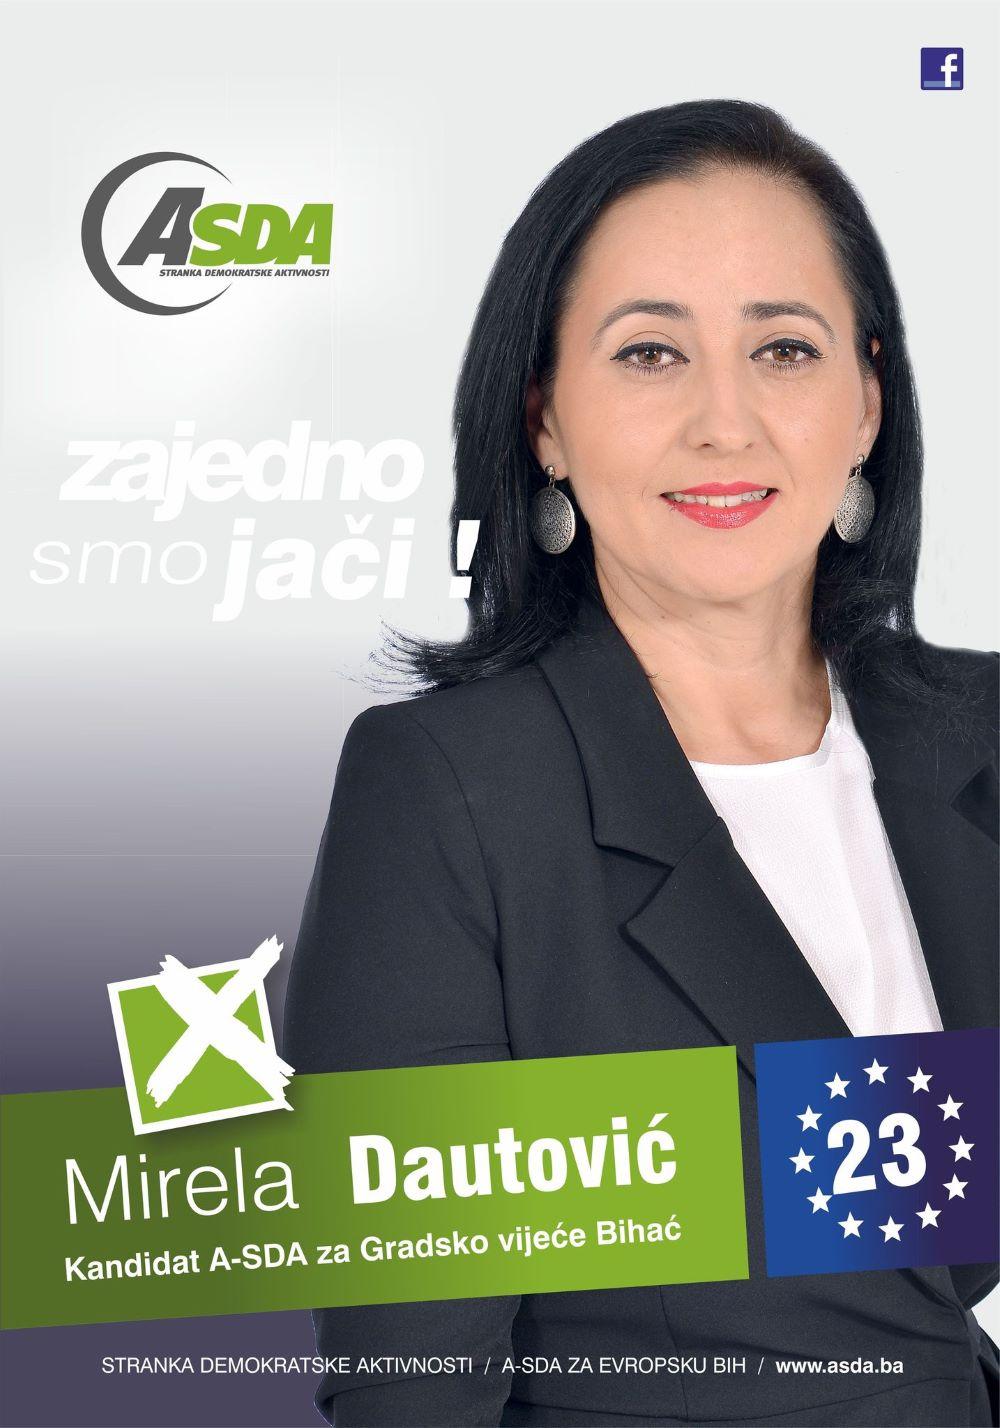 Mirela Dautović